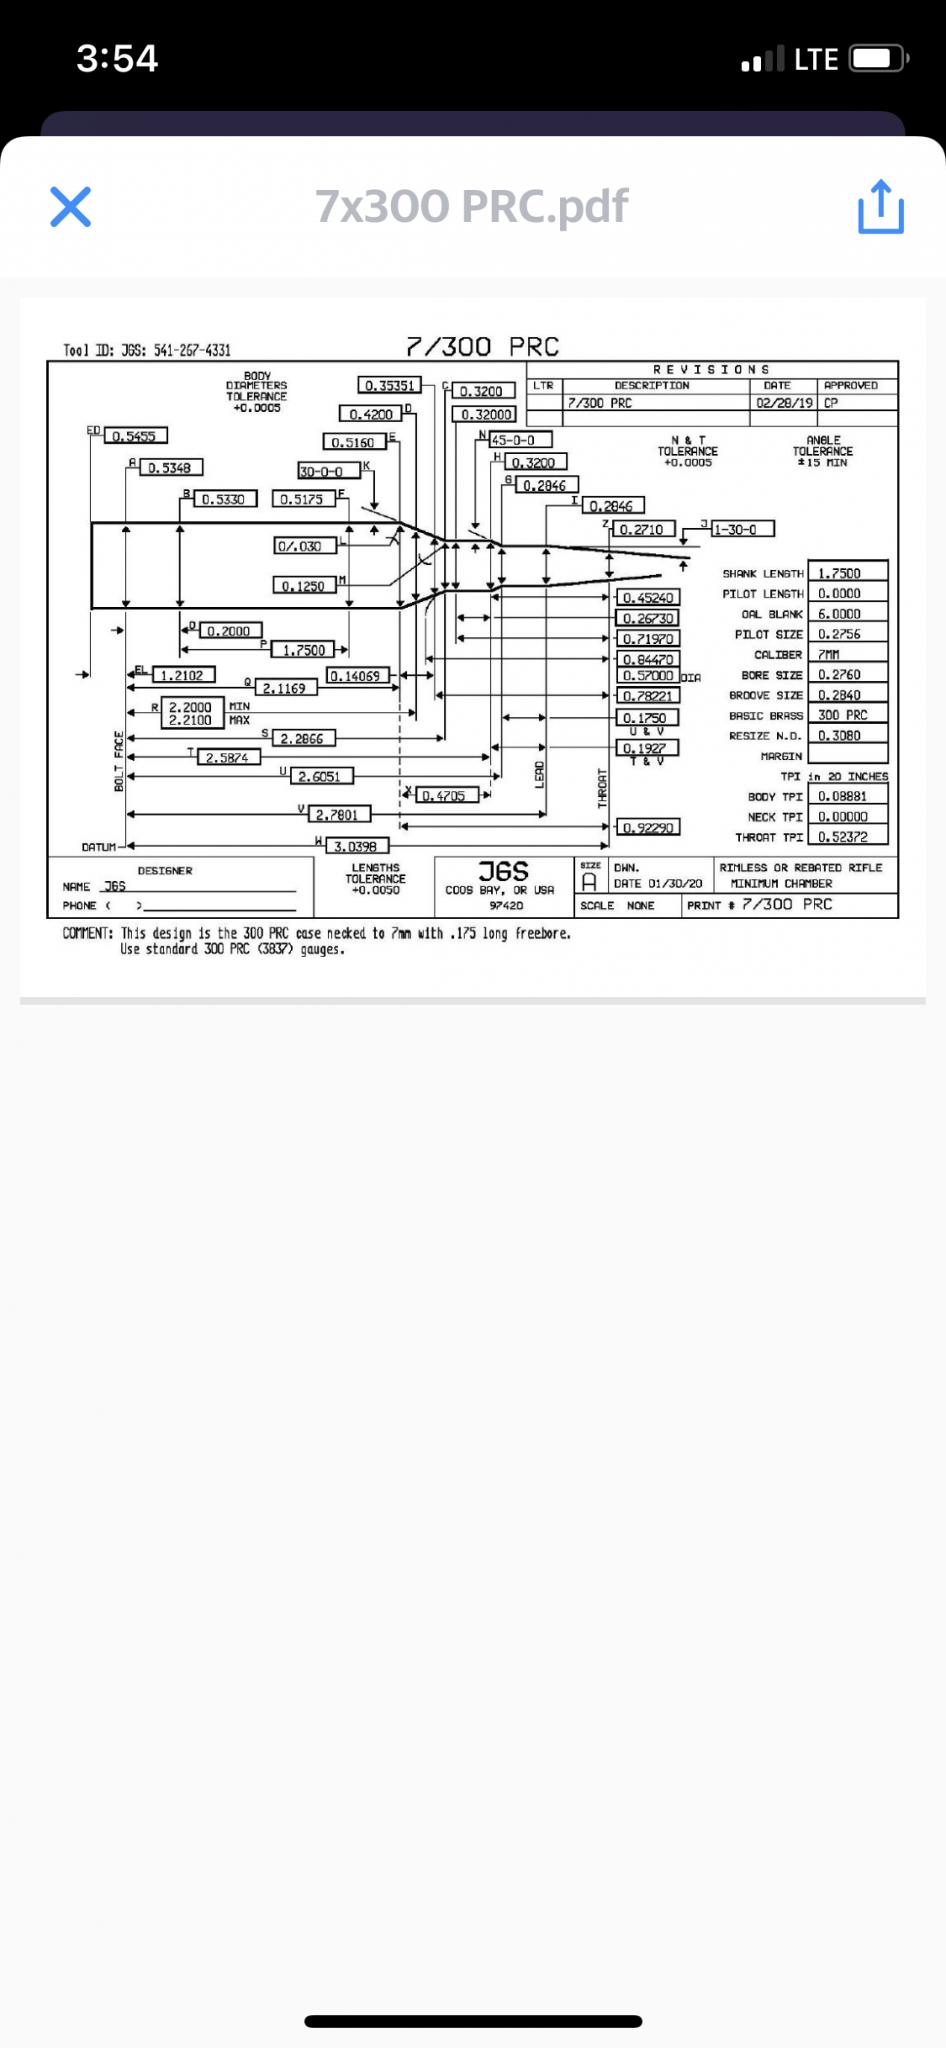 F08ADBB7-EE6C-443D-BCCE-FAF4D5E13B16.png